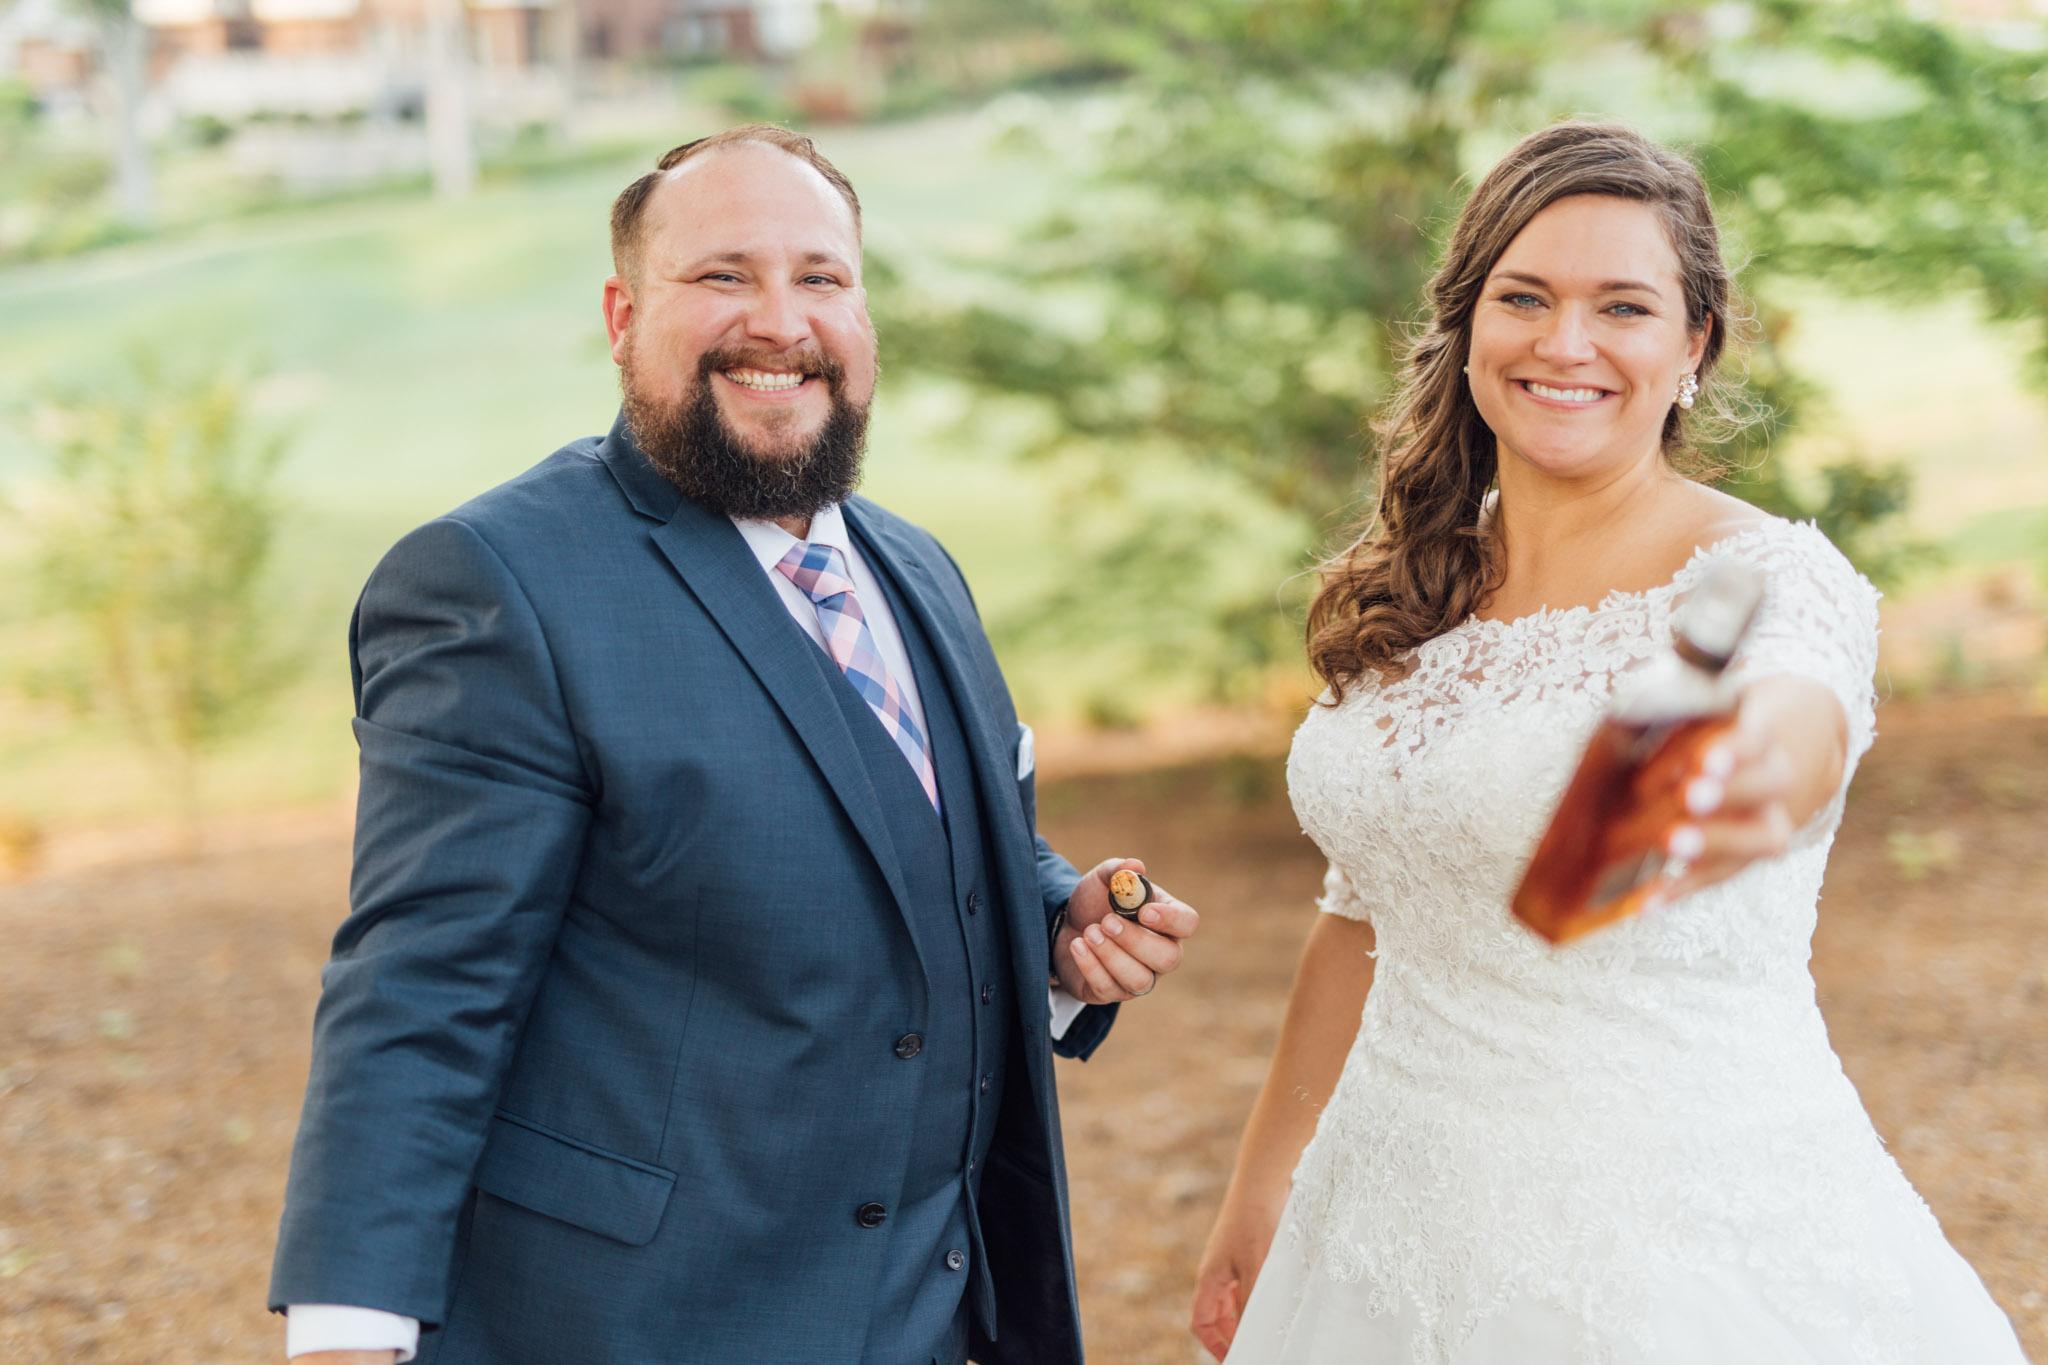 Country Club of Virginia Wedding Photographer_0091.jpg